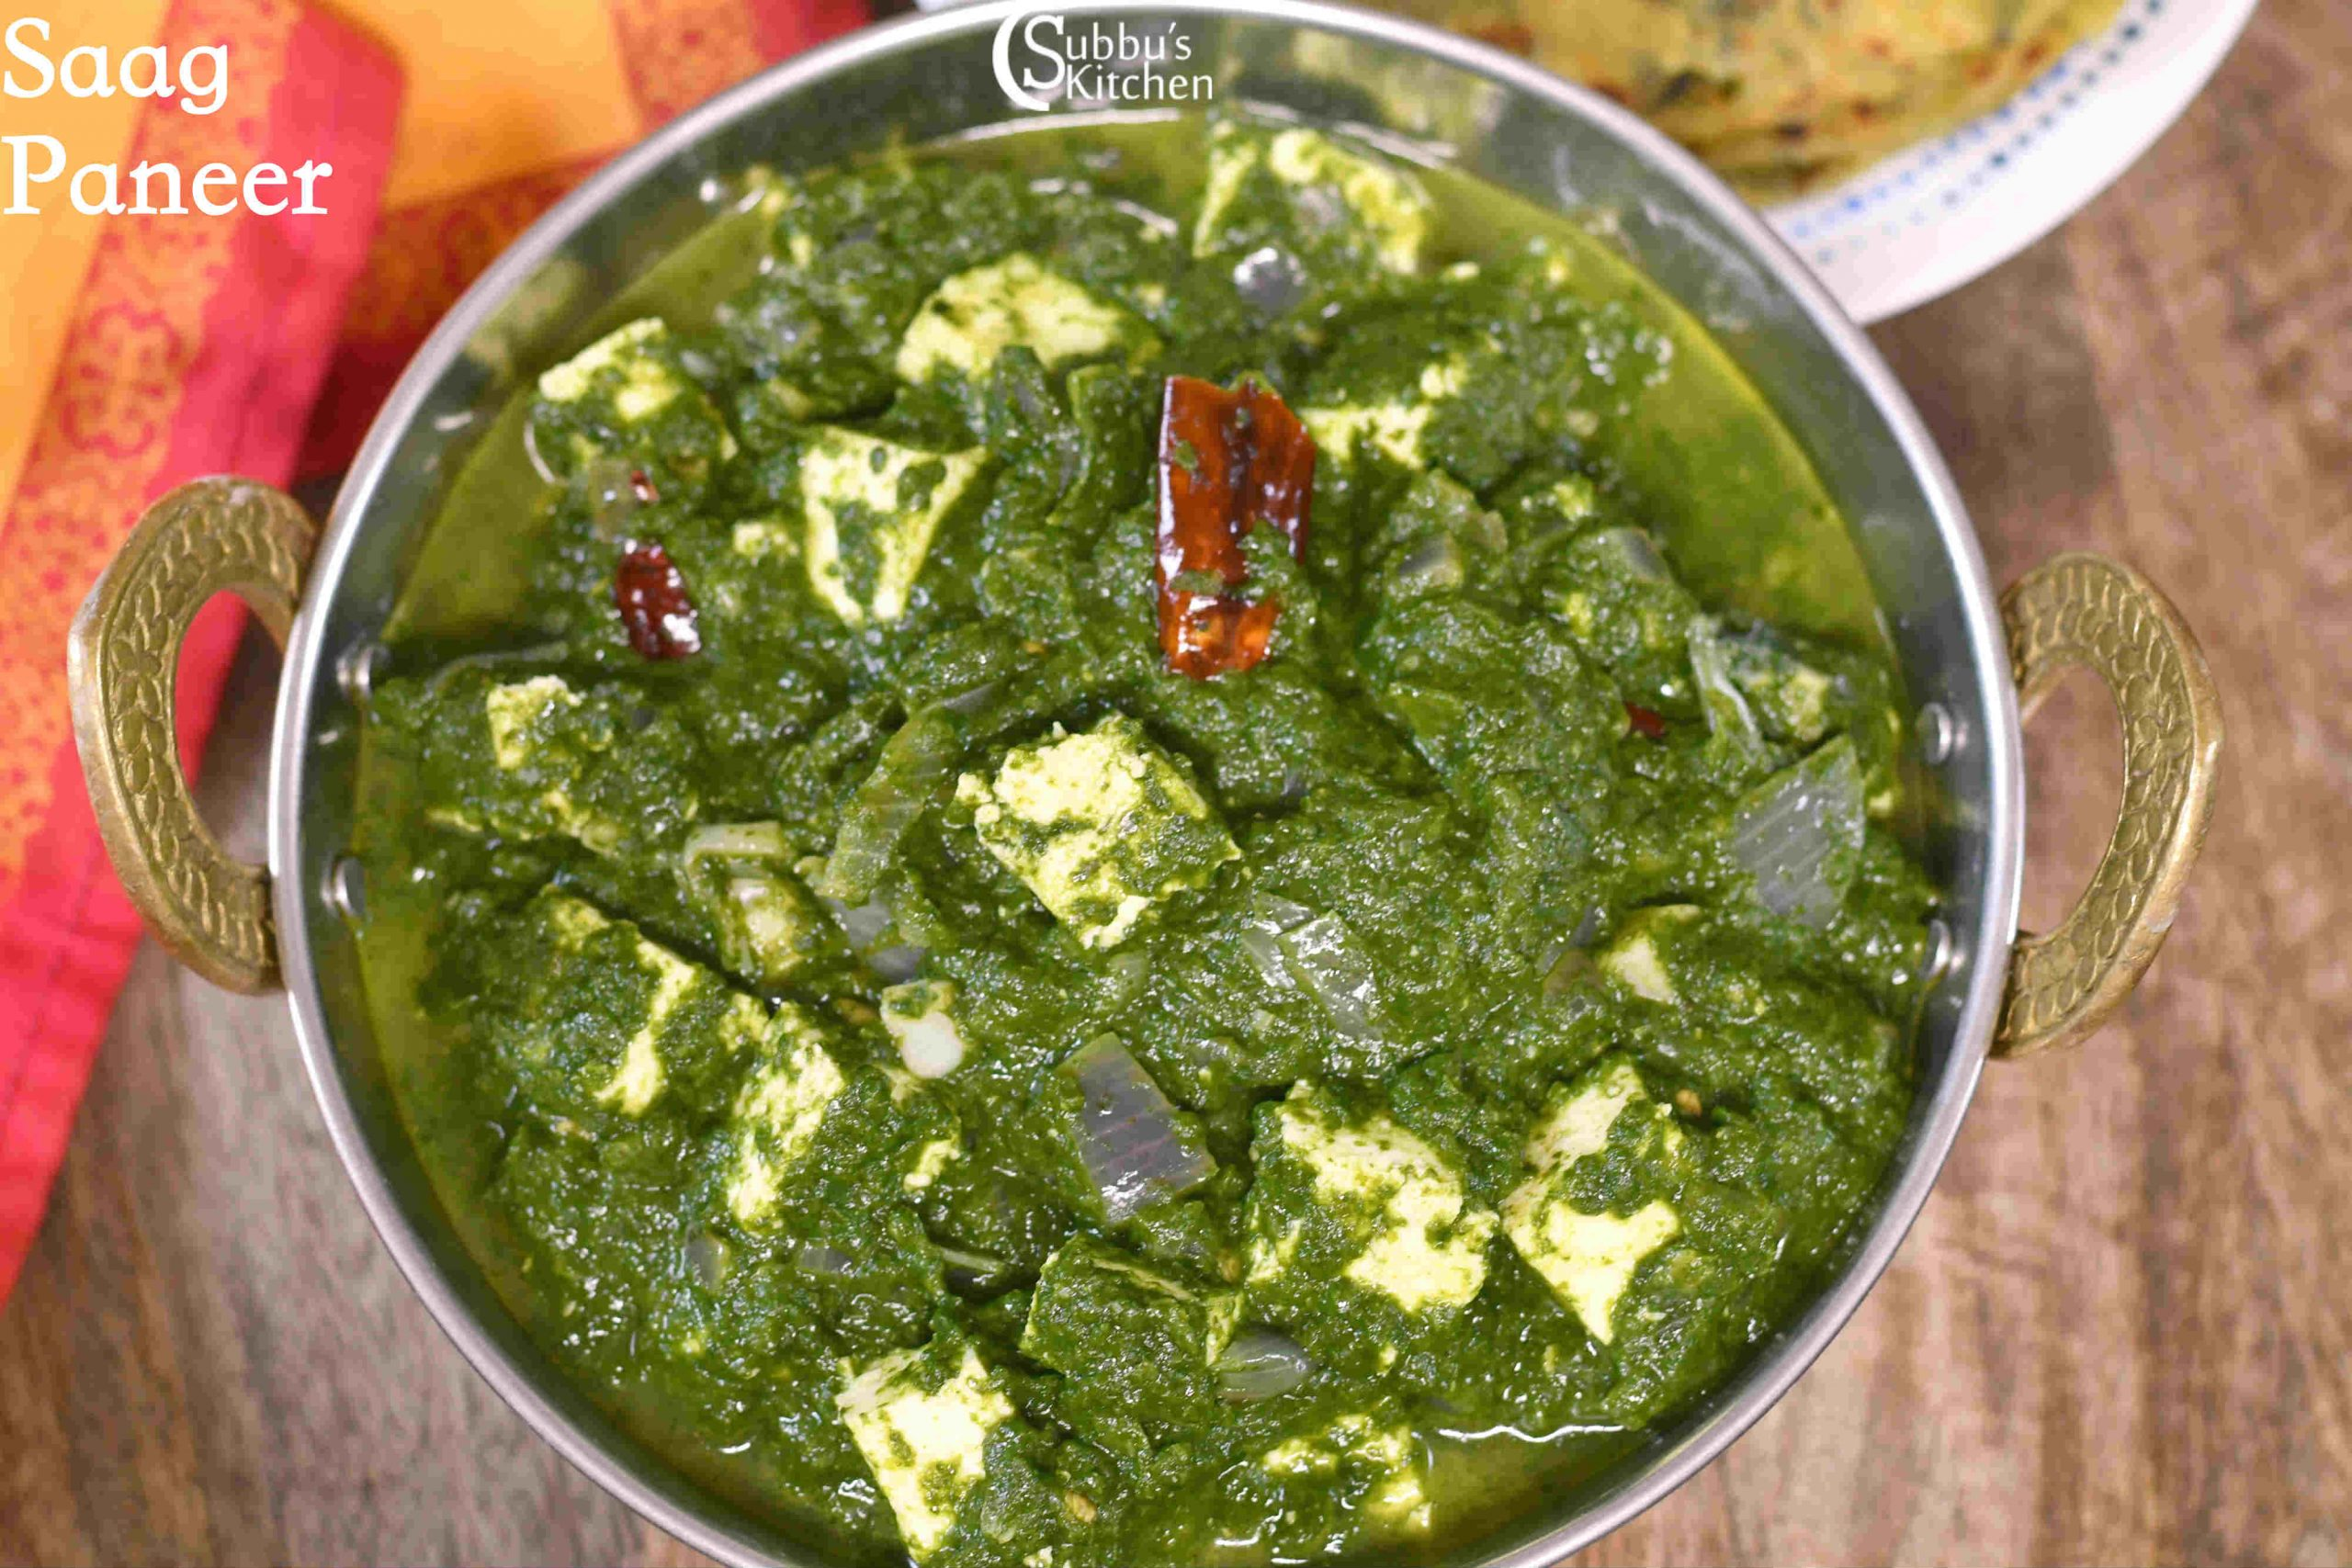 Sarson Ka Saag Recipe Saag Paneer Recipe Subbus Kitchen